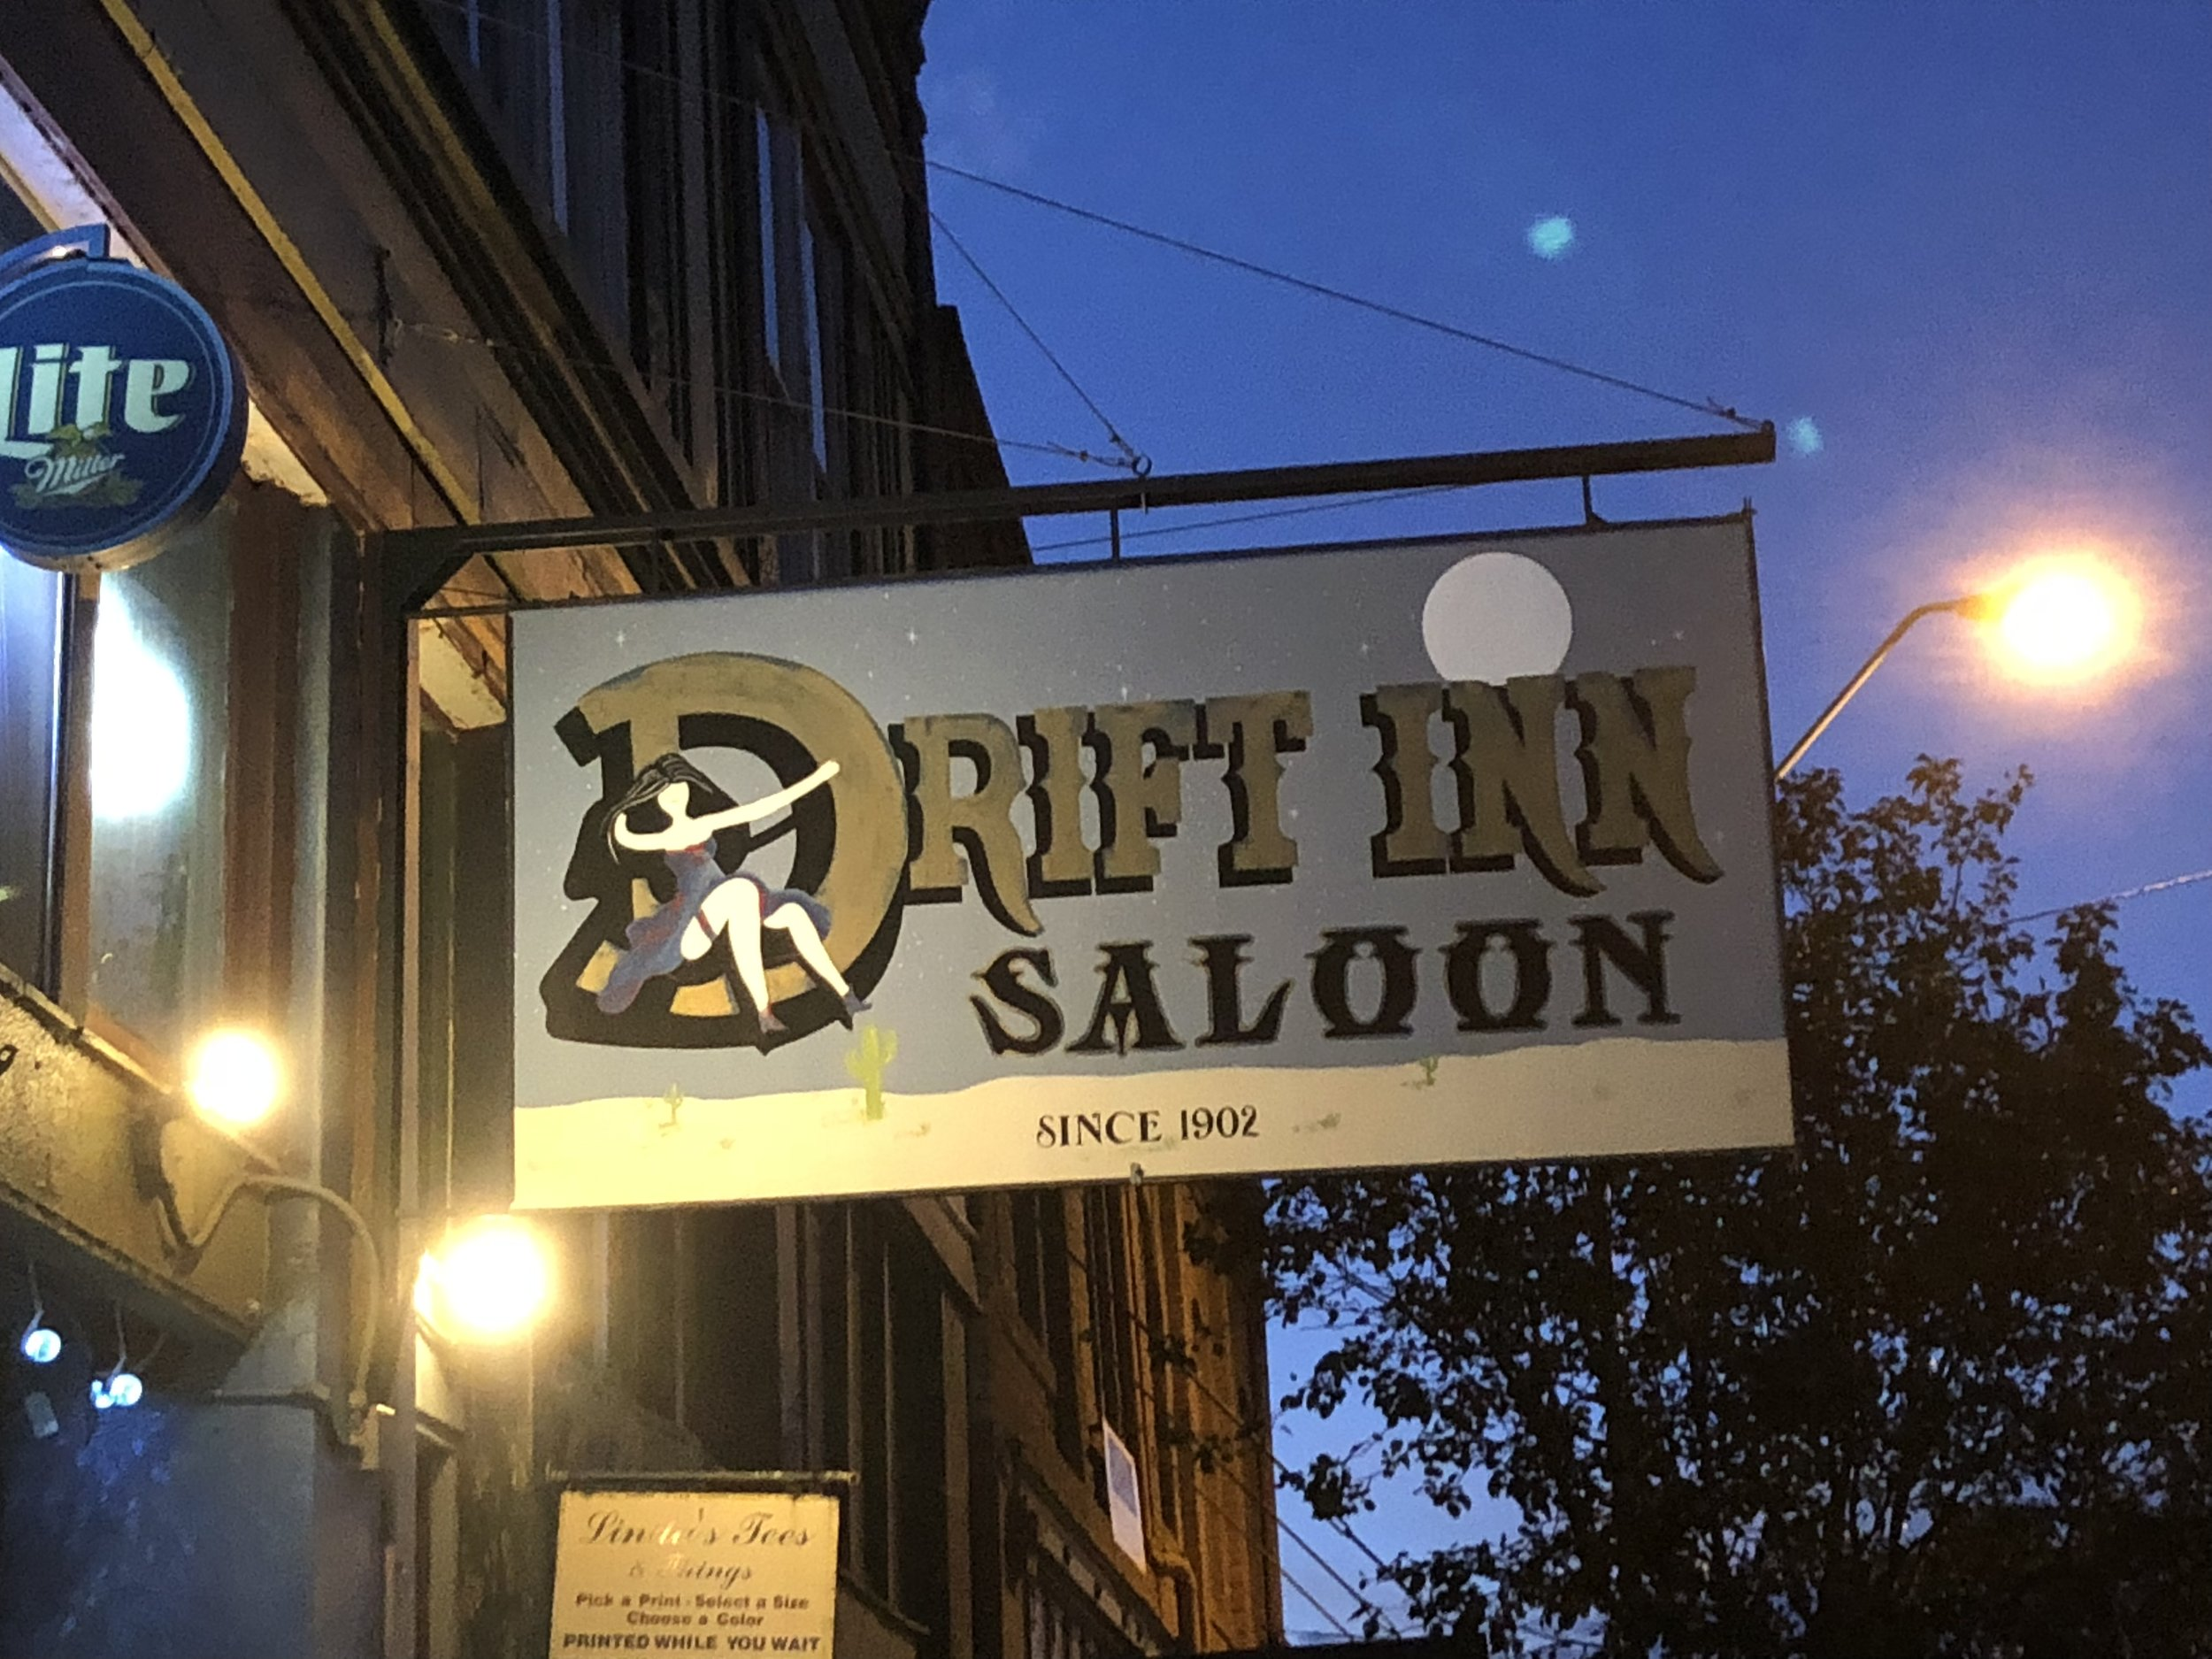 The oldest bar in Arizona.